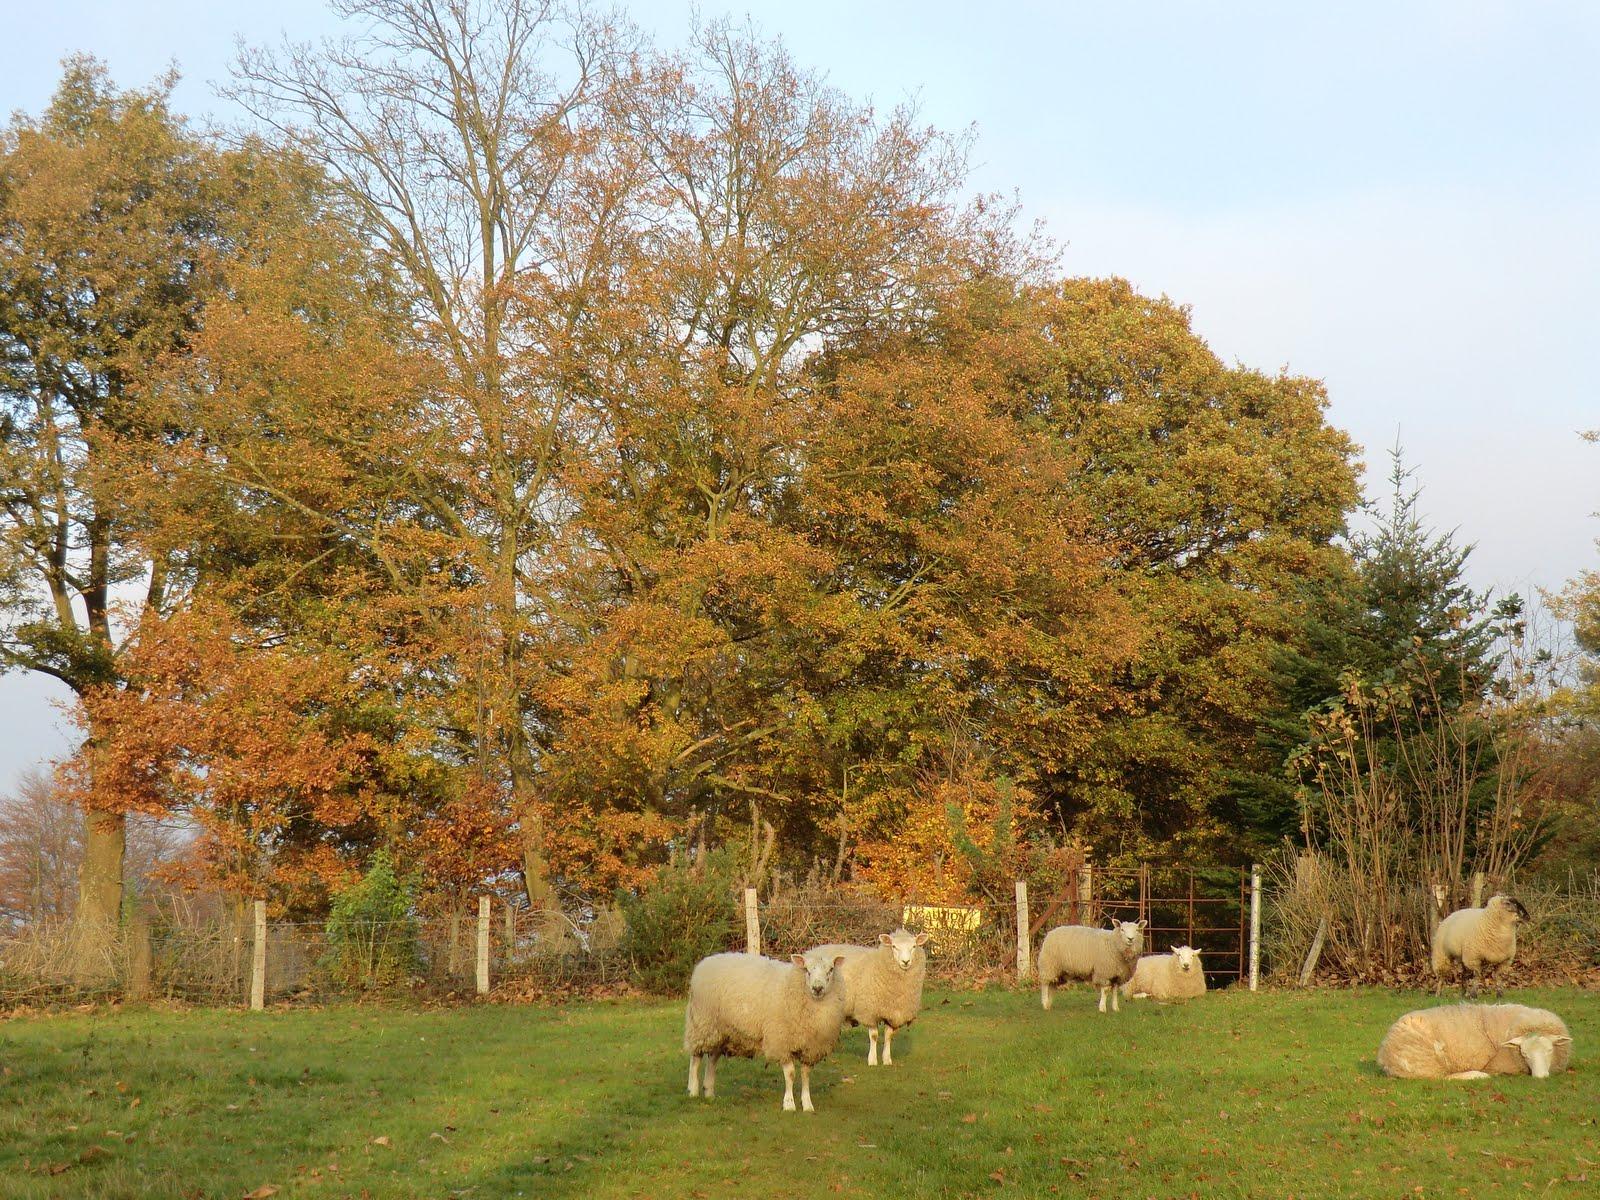 CIMG0329 Sheep field, Tandridge